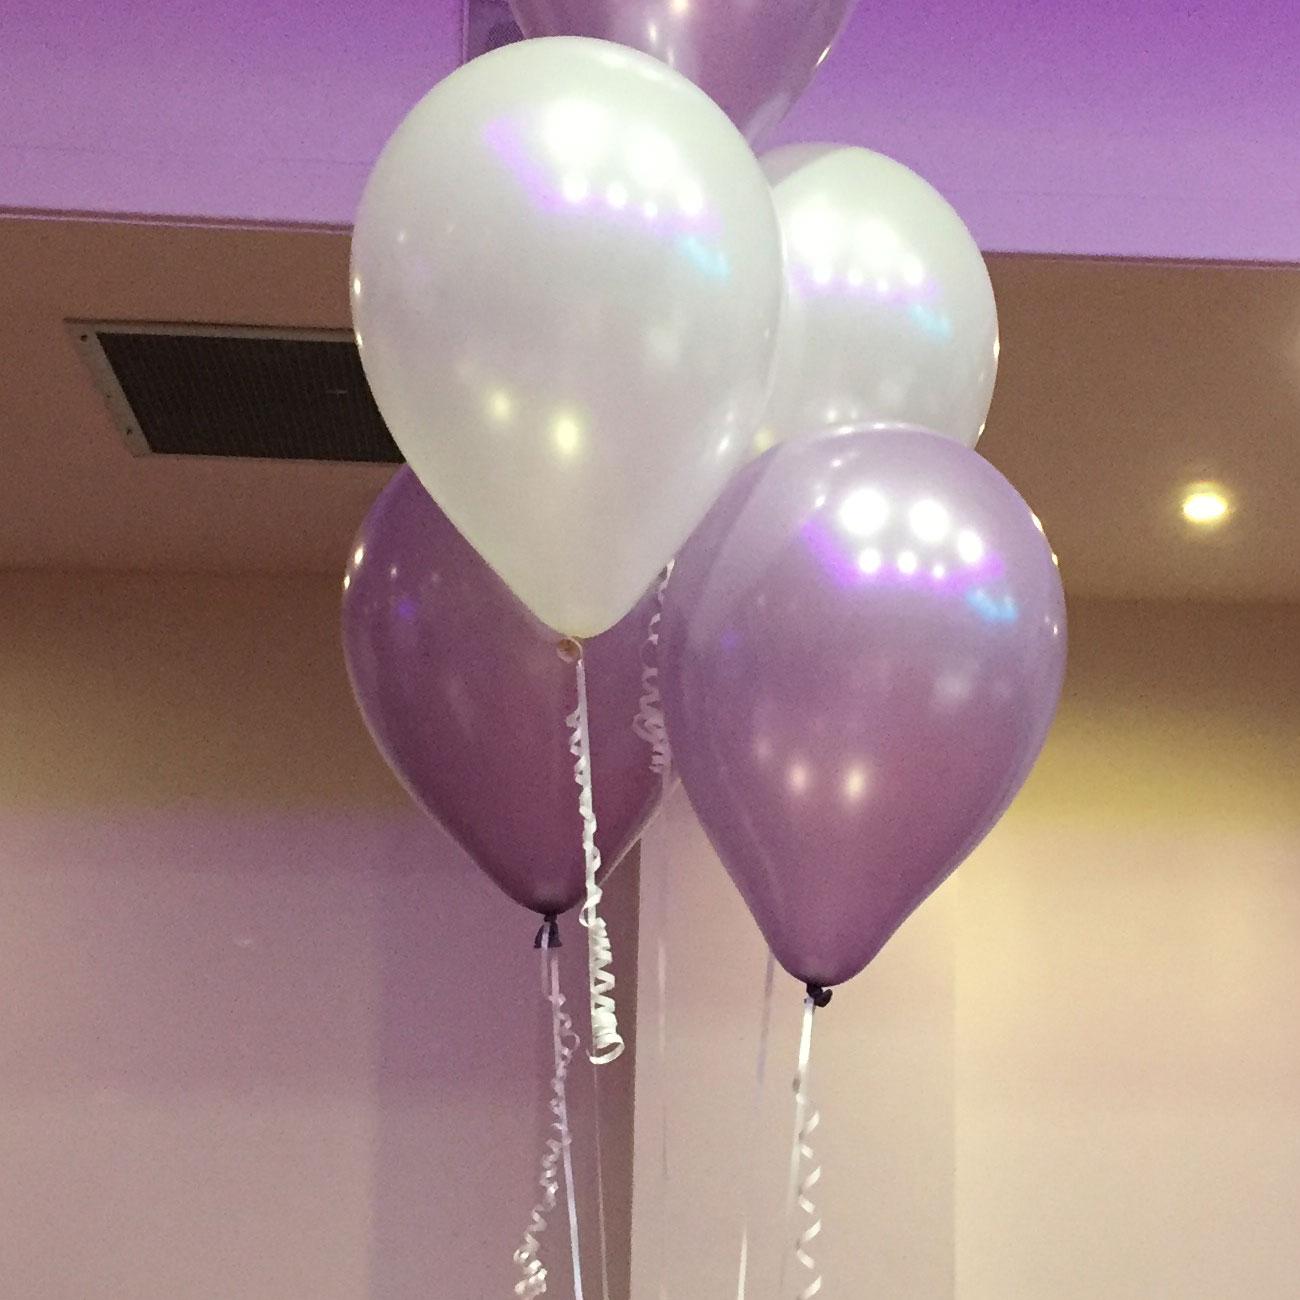 balloons-square-2.jpg